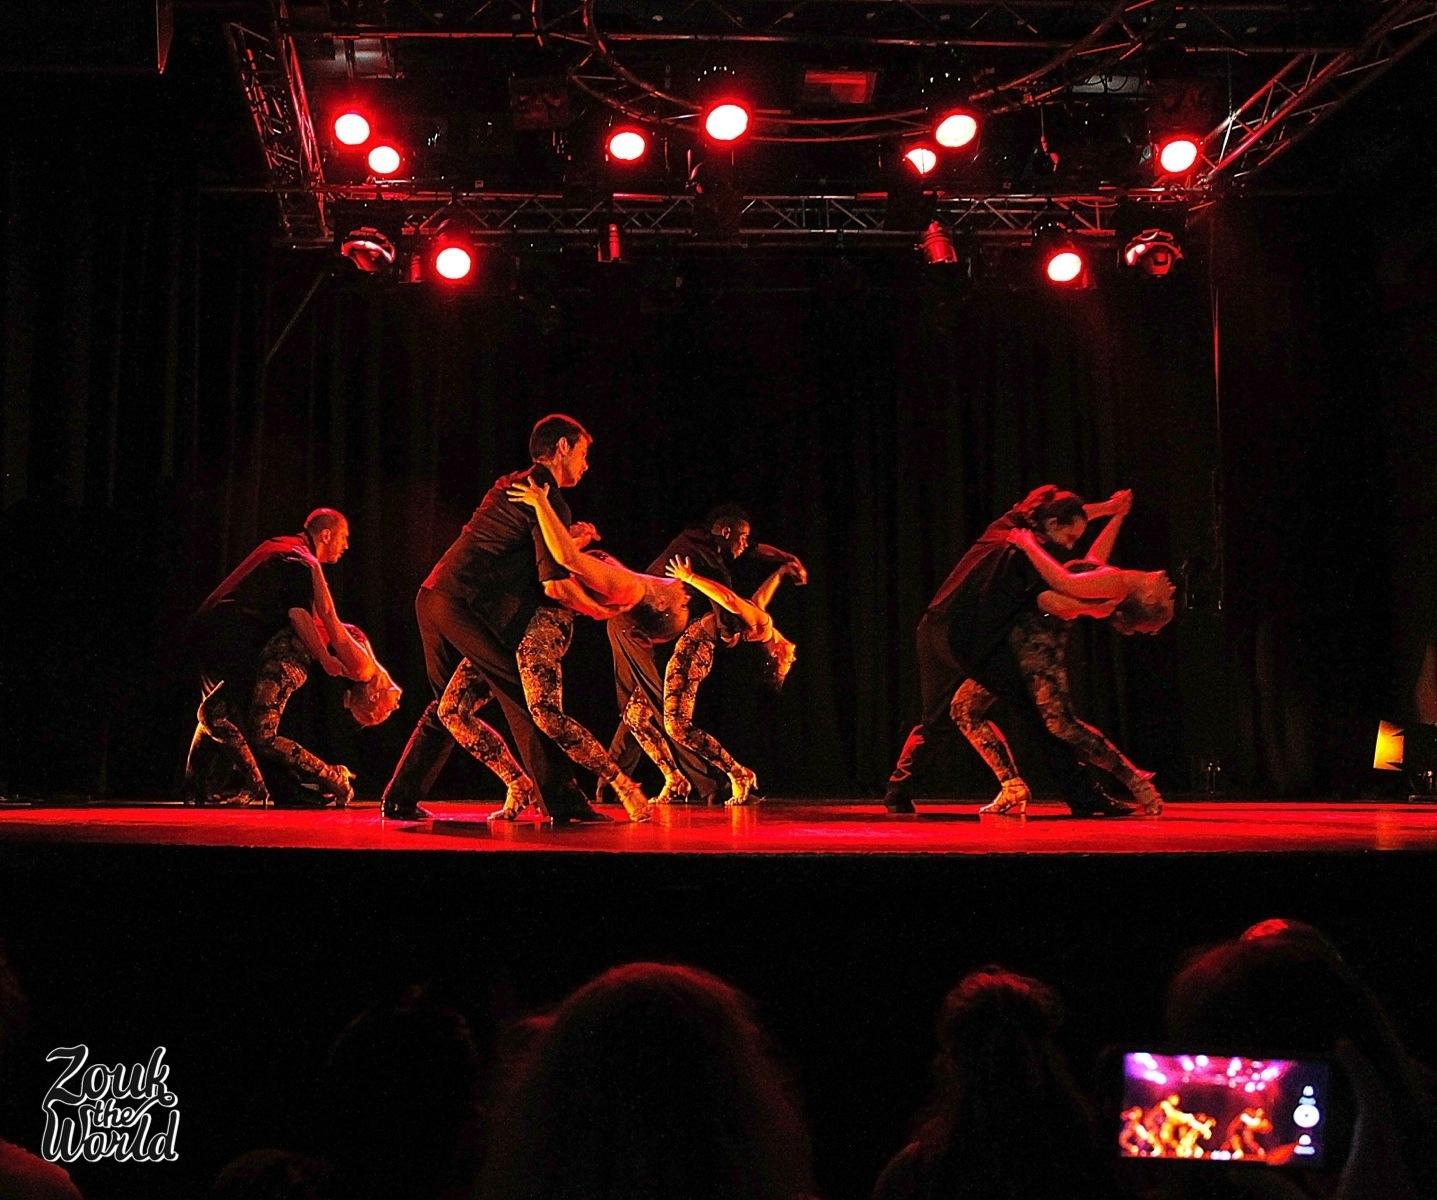 Rio Zouk Style team's performance